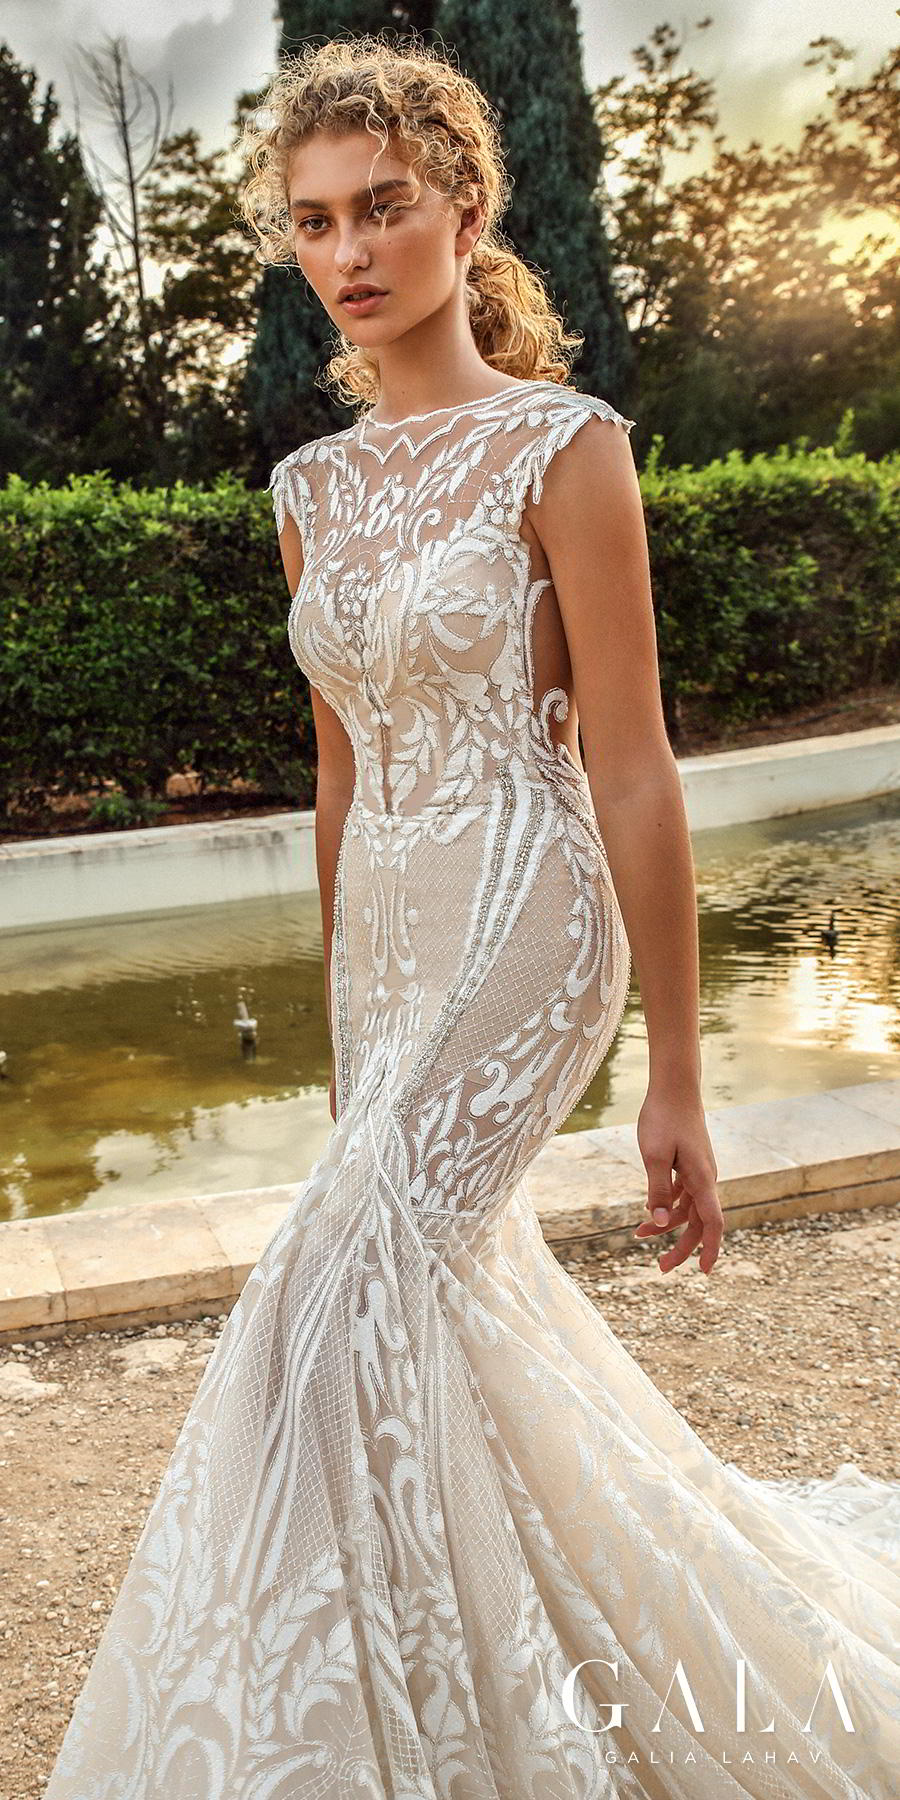 galia lahav gala fall 2019 bridal cap sleeves illusion bateau v neck full embellishment glamorous elegant fit and flare mermaid wedding dress chapel train (202) zsdv